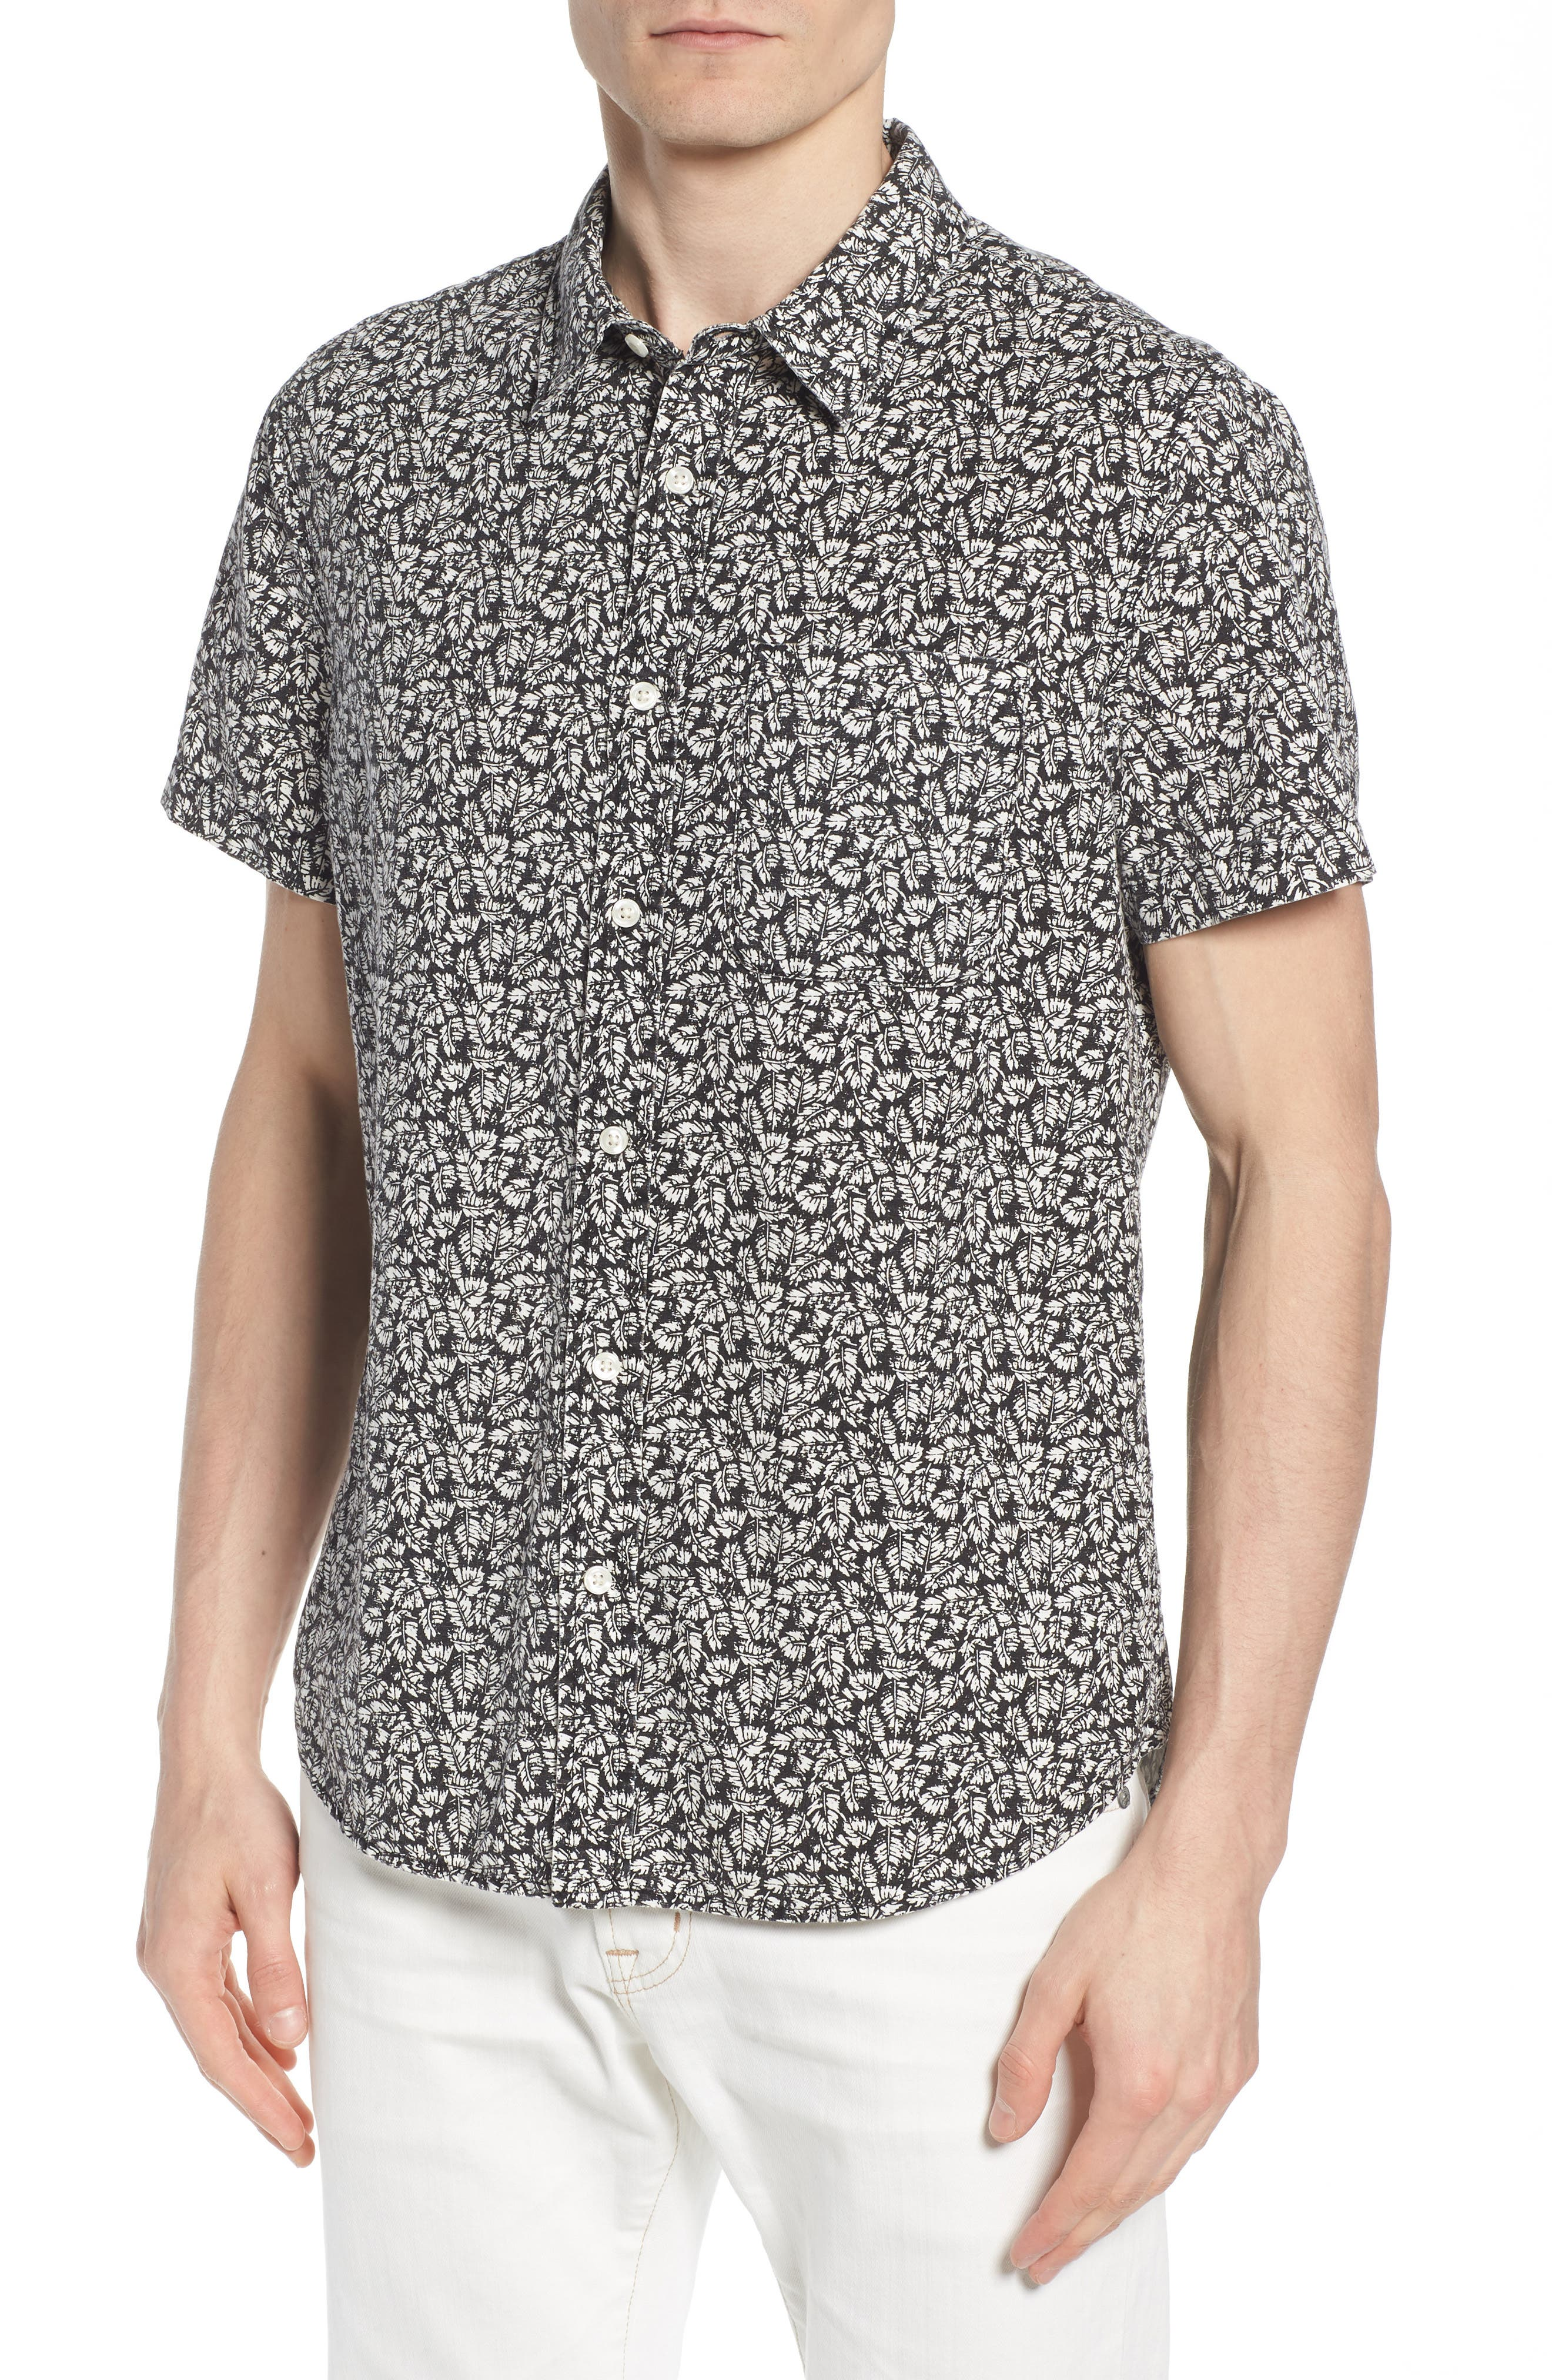 Nash Regular Fit Short Sleeve Sport Shirt,                             Main thumbnail 1, color,                             Palm Leaf True Black/ White